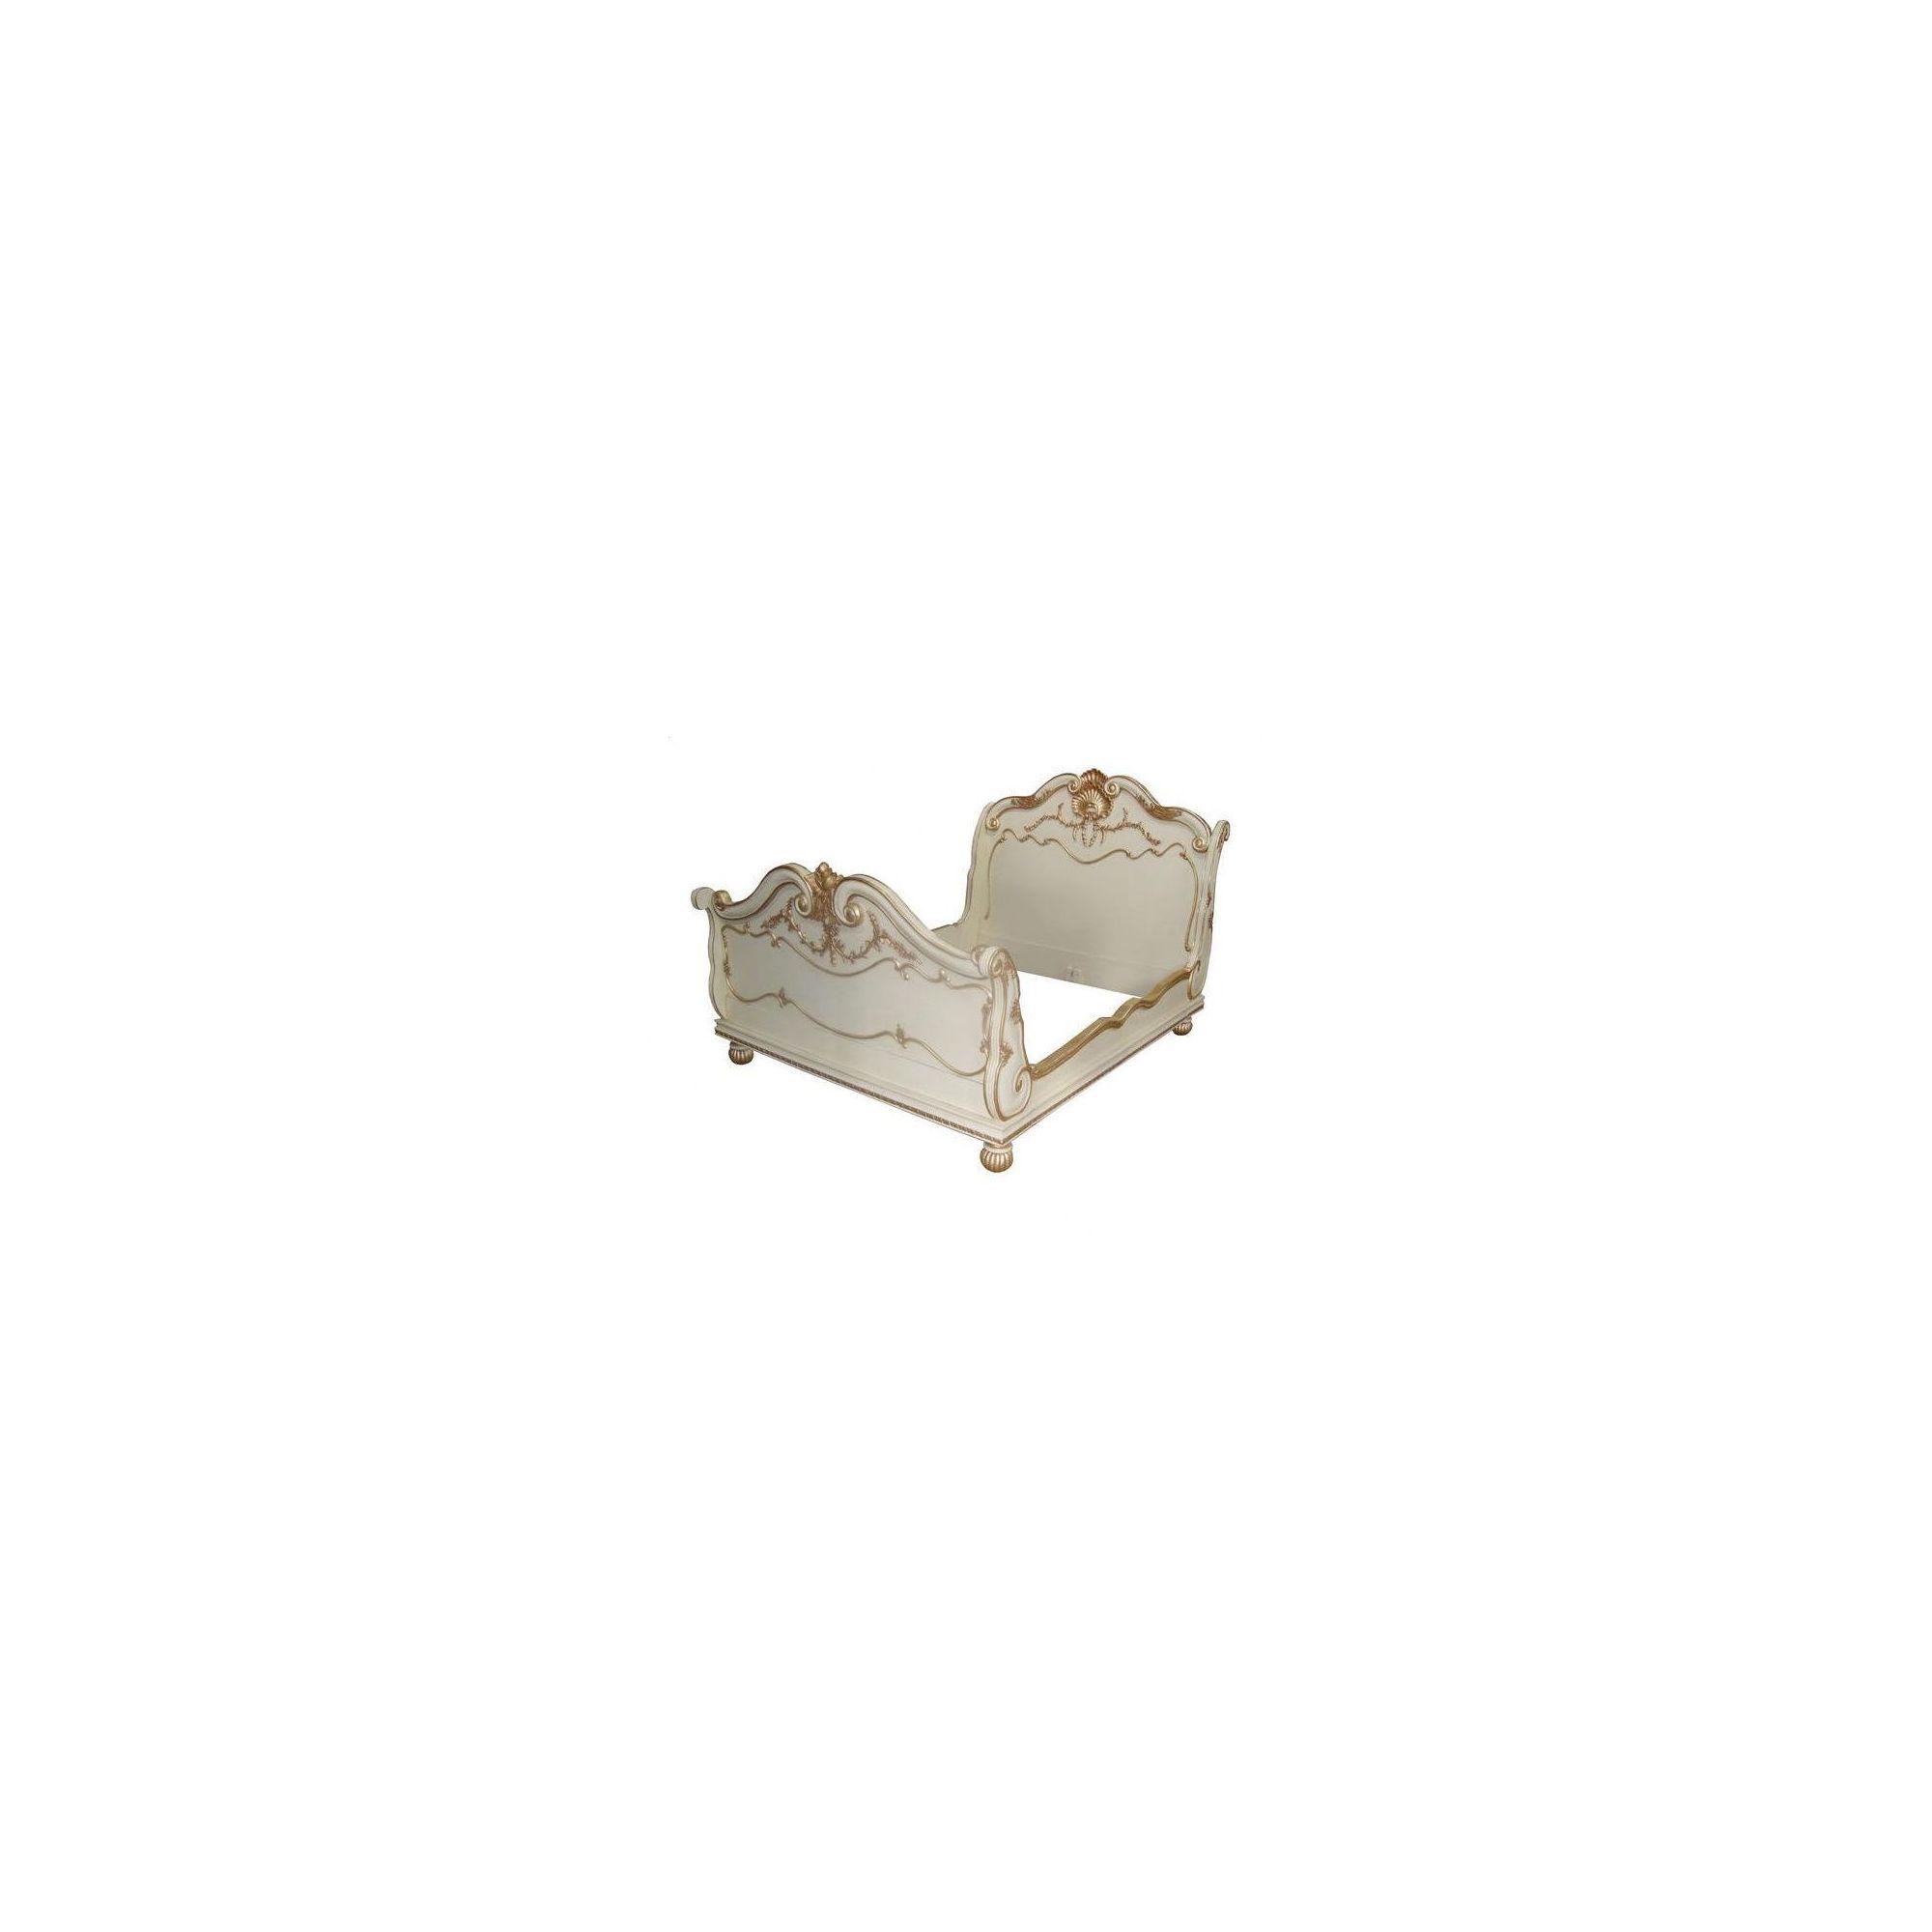 Lock stock and barrel Mahogany Shell Bed in Mahogany - Wax - King at Tesco Direct